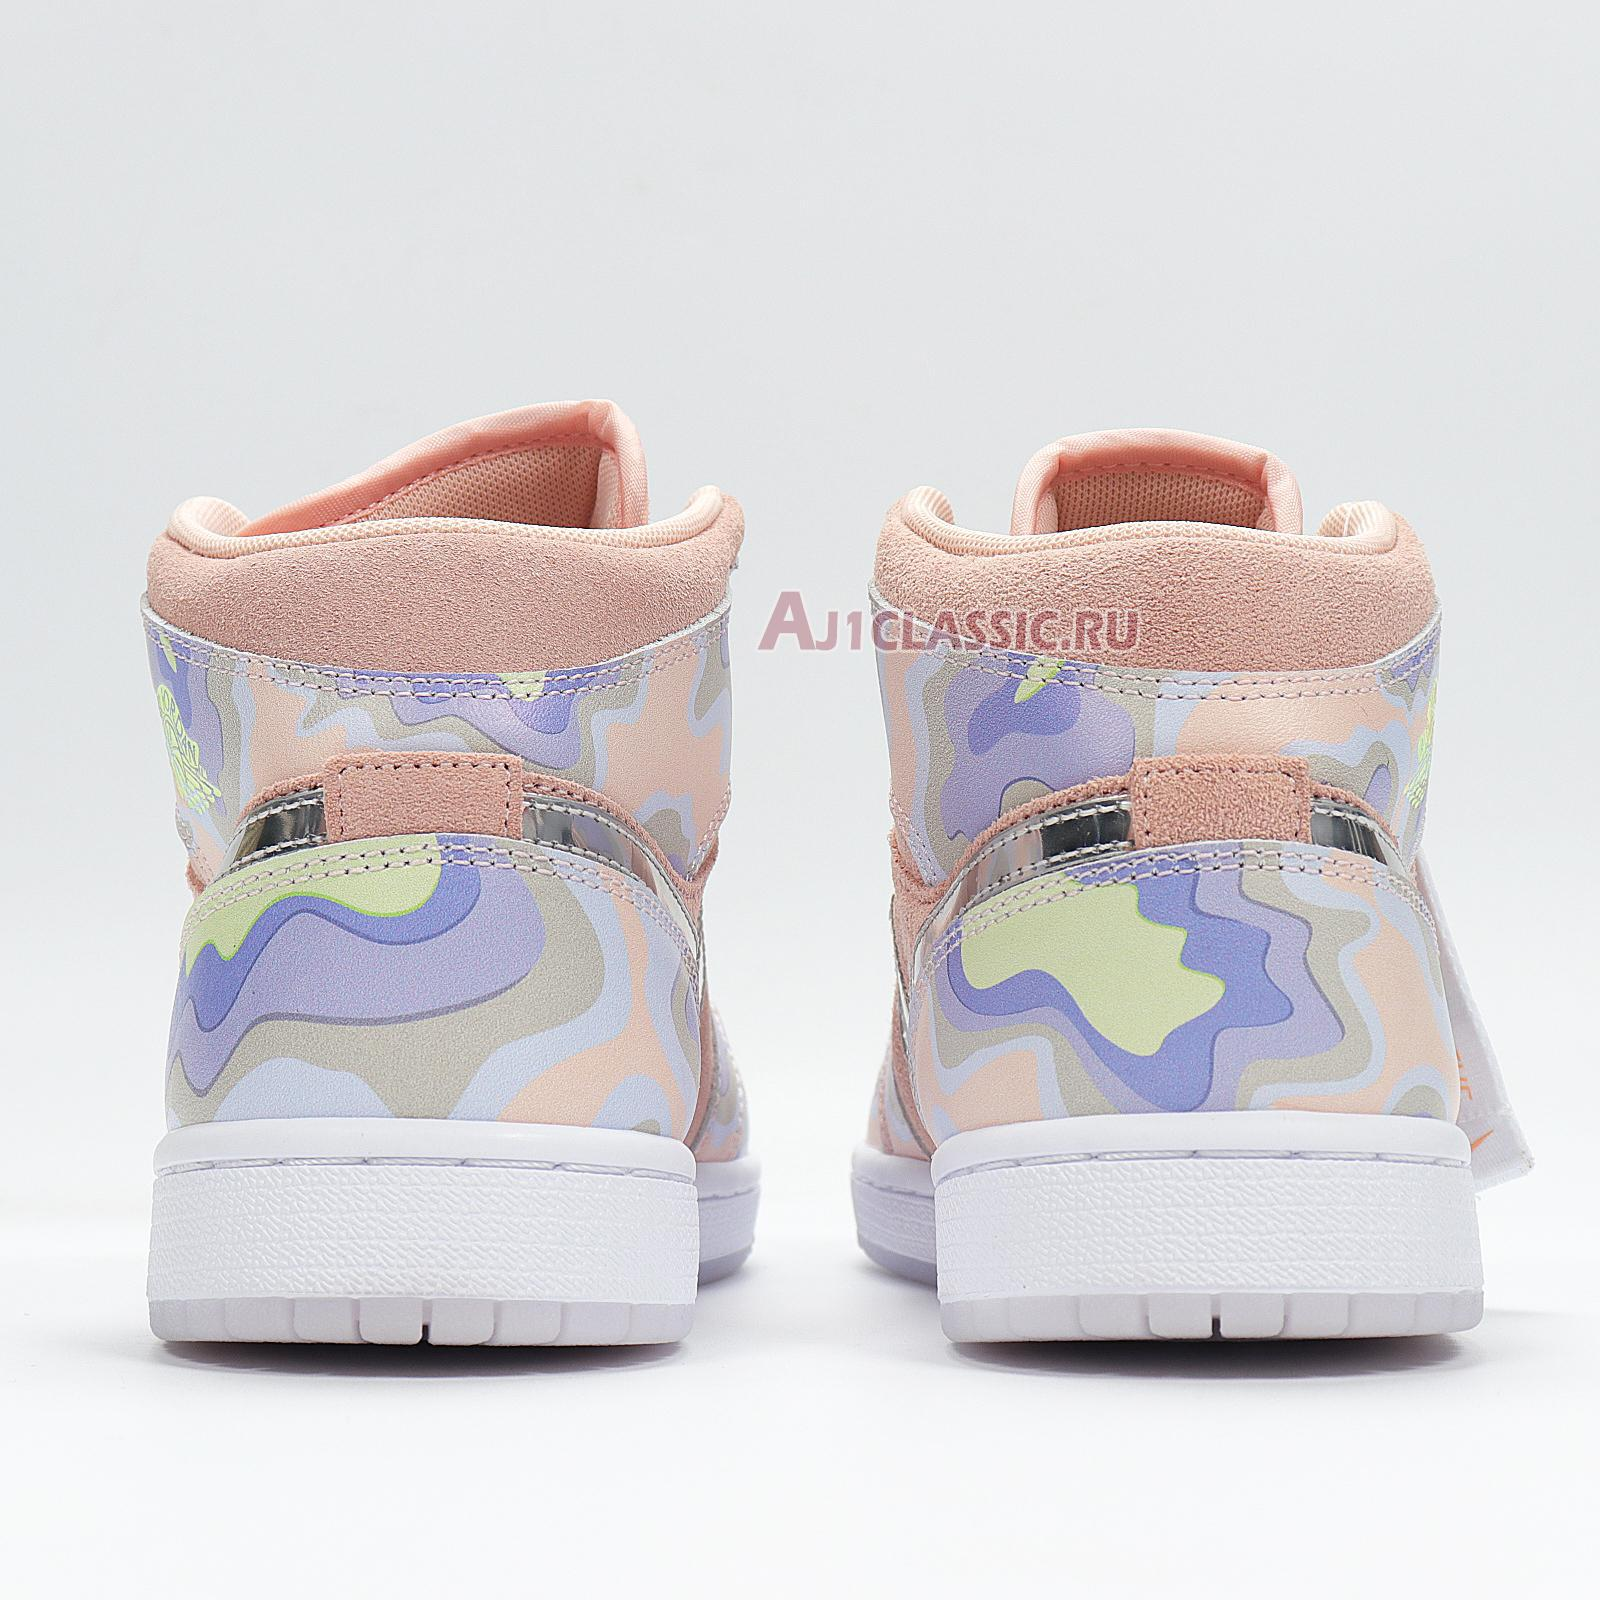 "Air Jordan 1 Mid SE ""P Her Spective"" CW6008-600"